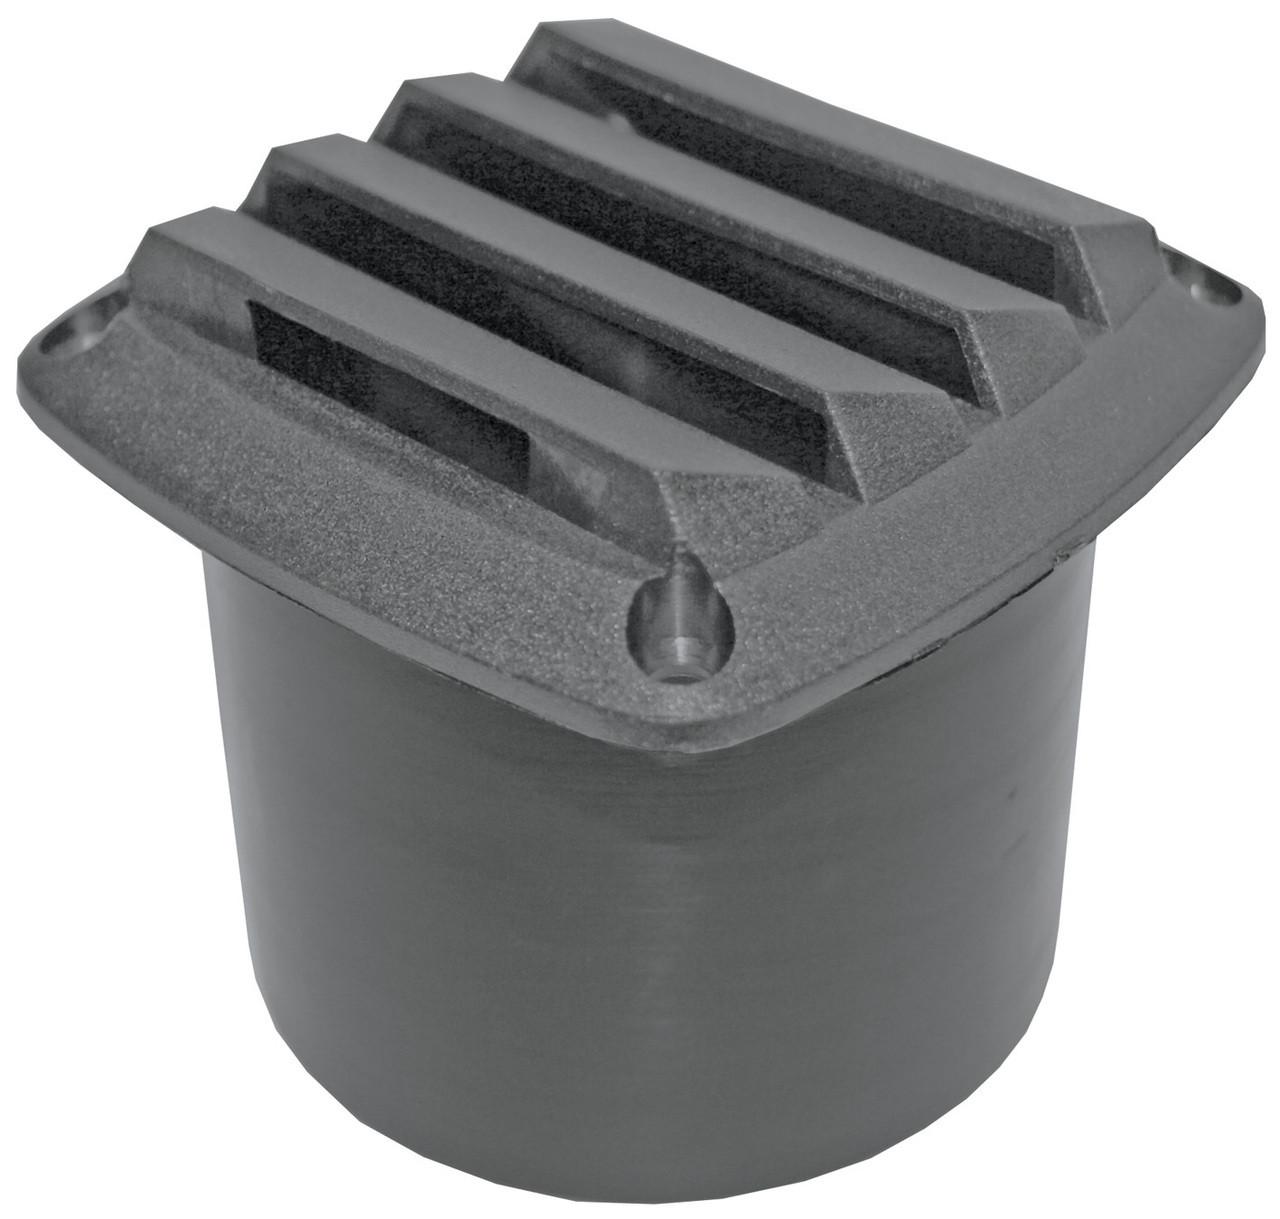 Vent -Black Nyl 75mm Hose